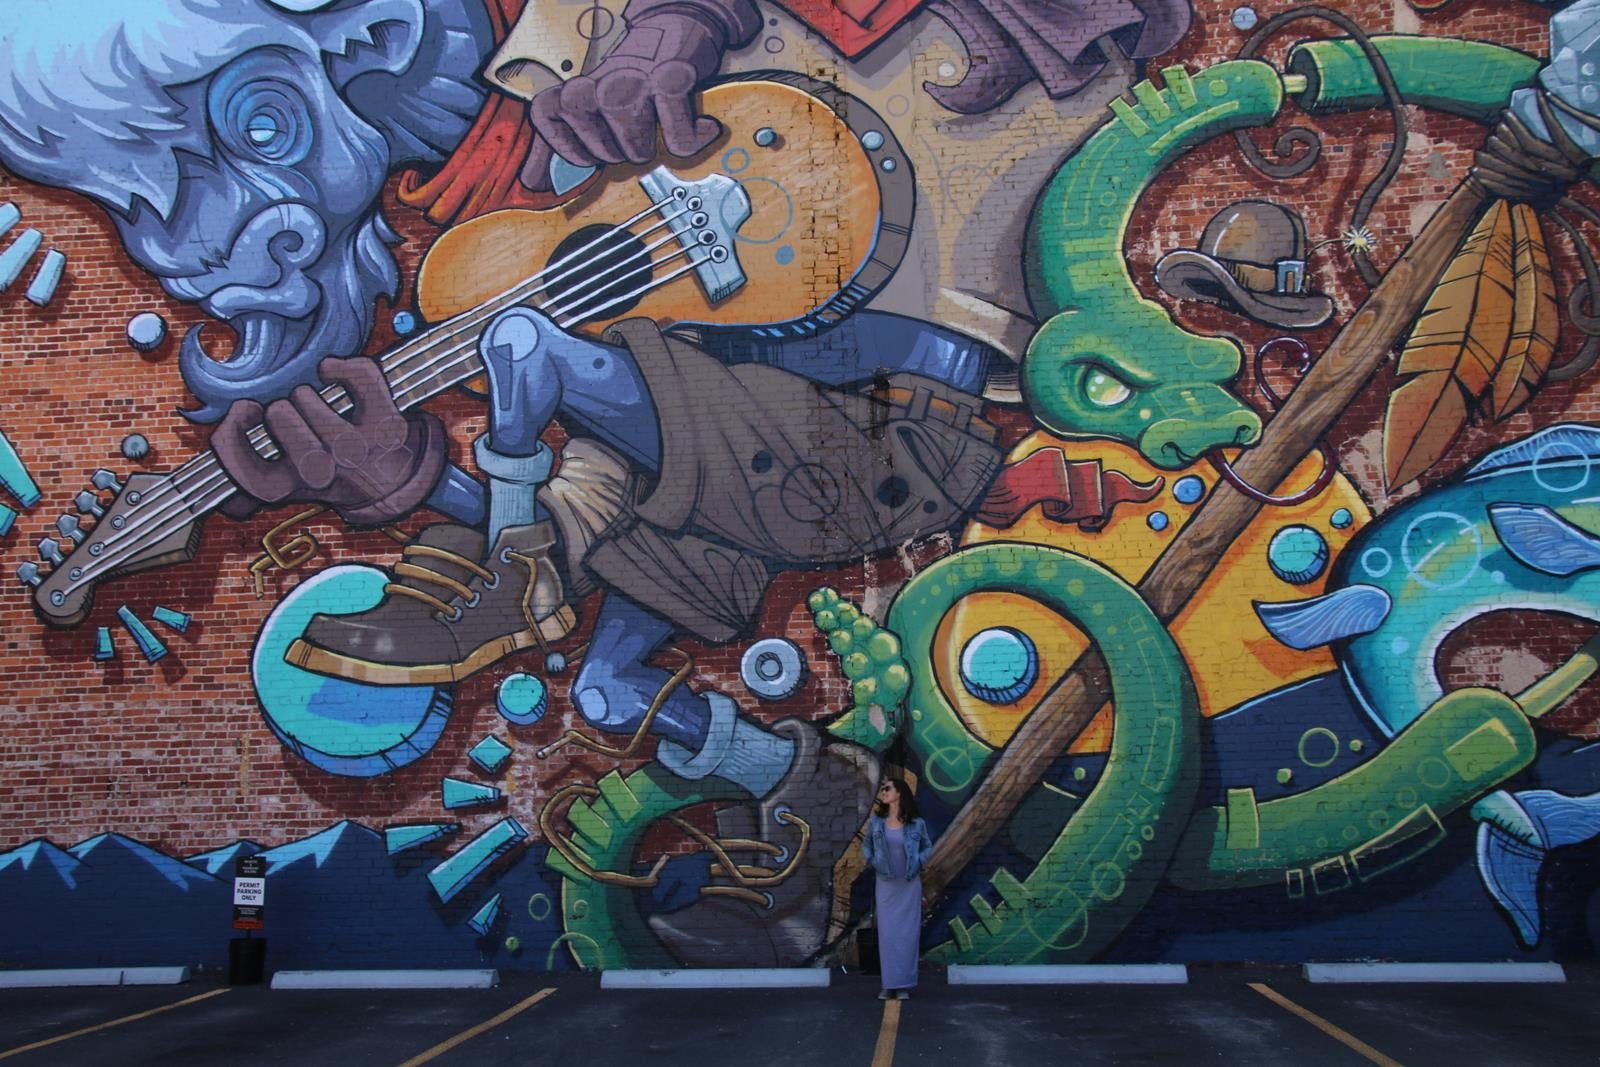 mural, cheyenne, street art cheyenne